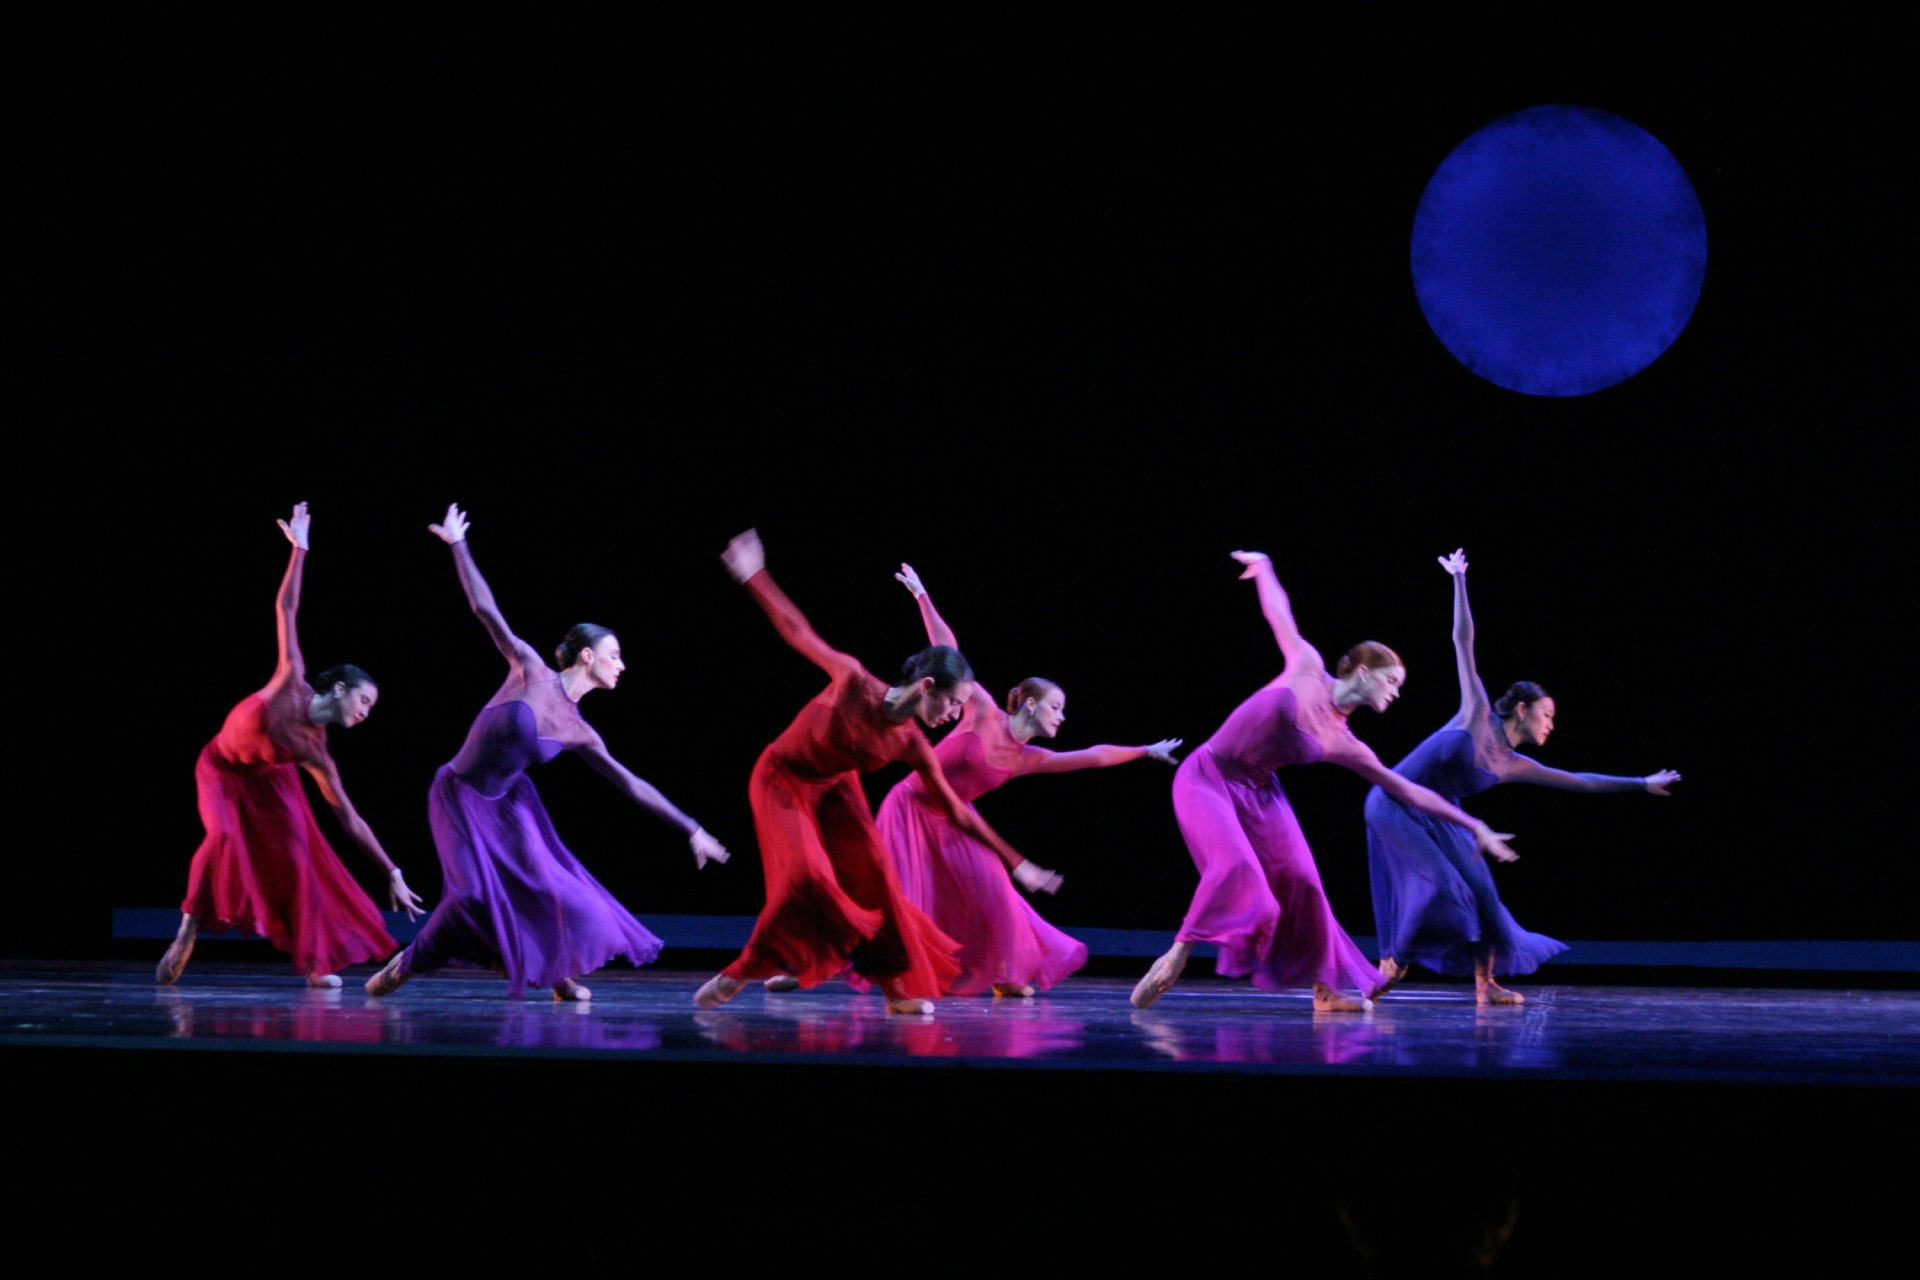 Ballerinas in brightly coloured monochrome dresses dance against blue moon in black sky.